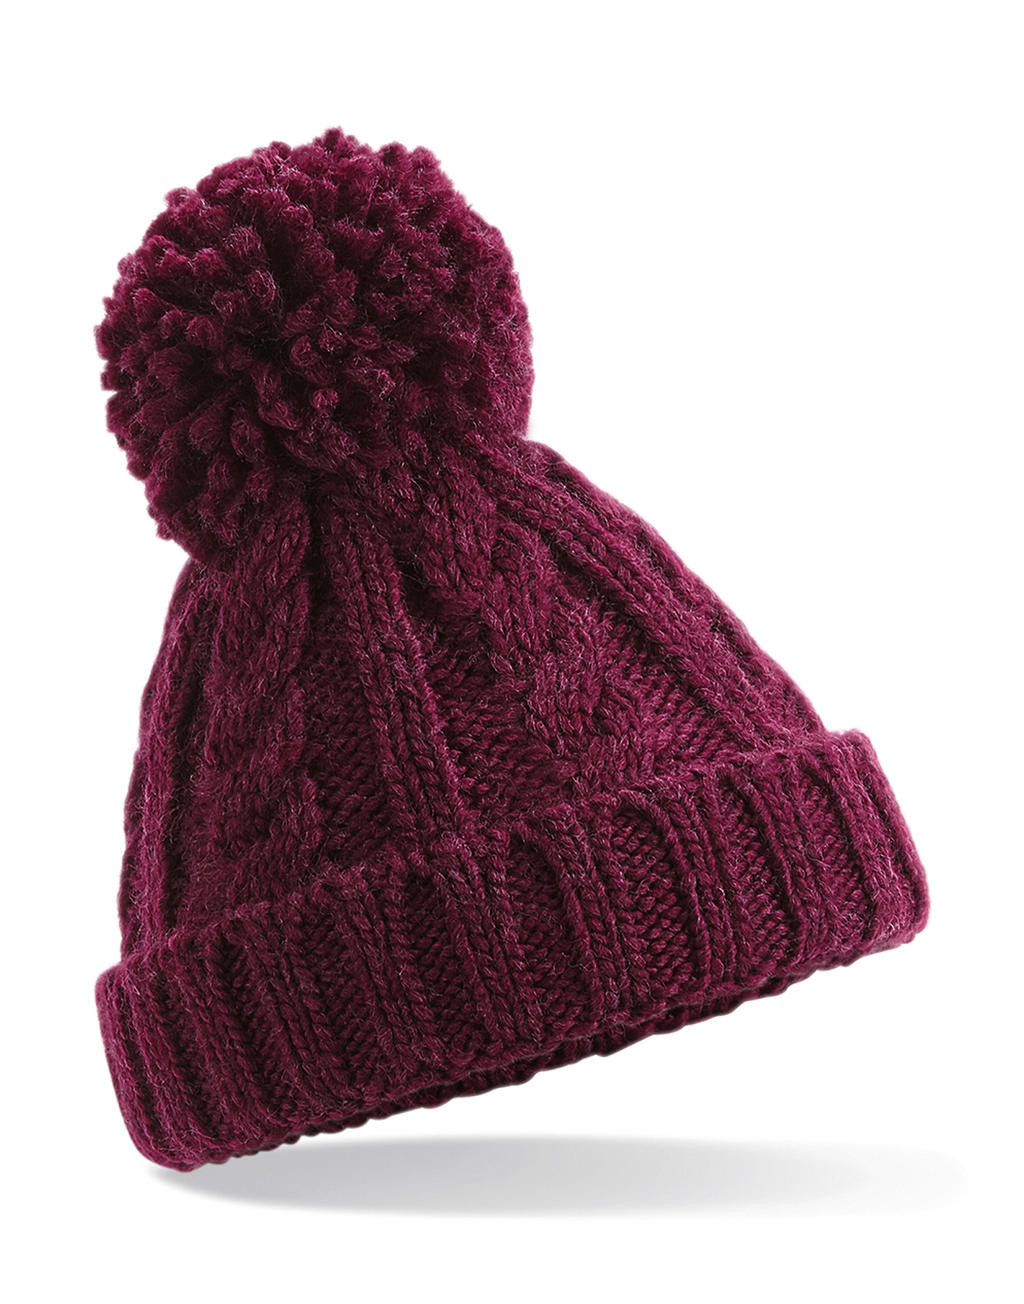 Beechfield Infant/Junior Cable Knit Melange Beanie